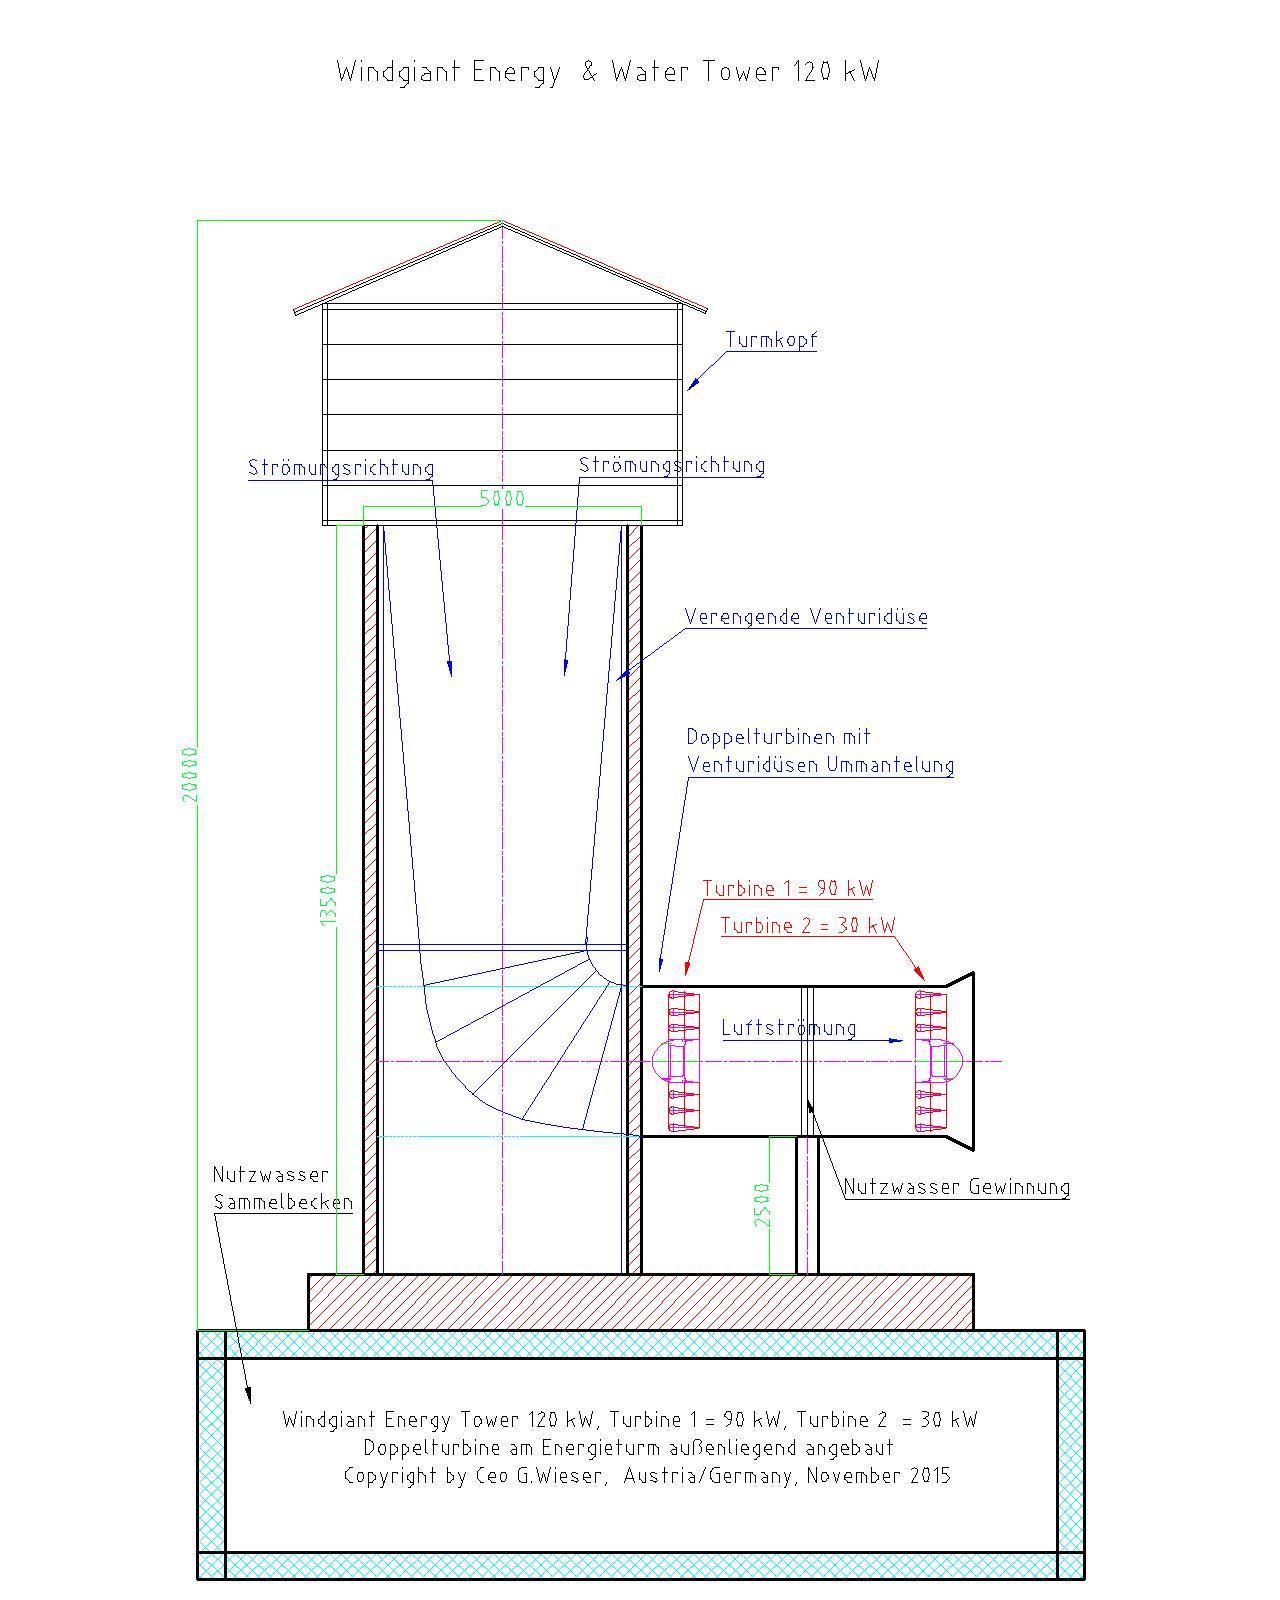 Energieturm-120_kW-_23.Nov.2015